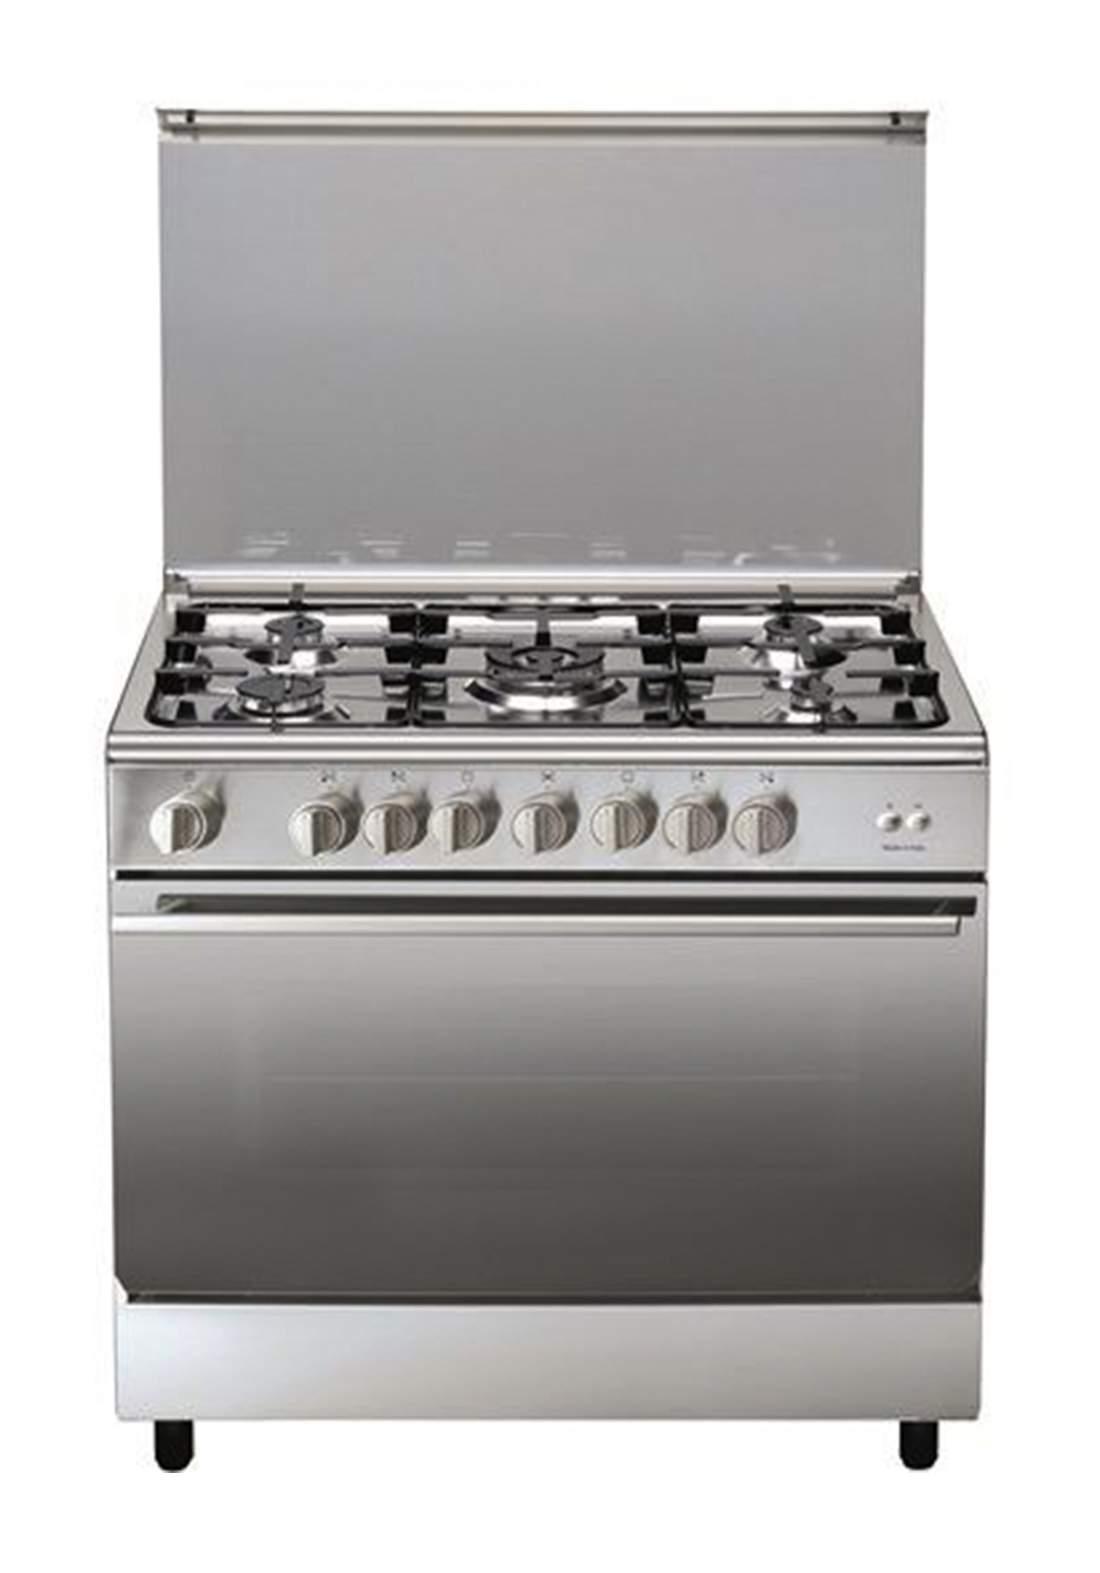 Ariston A9GG1FCXEX.1 Burners Cooker طباخ من اريسون